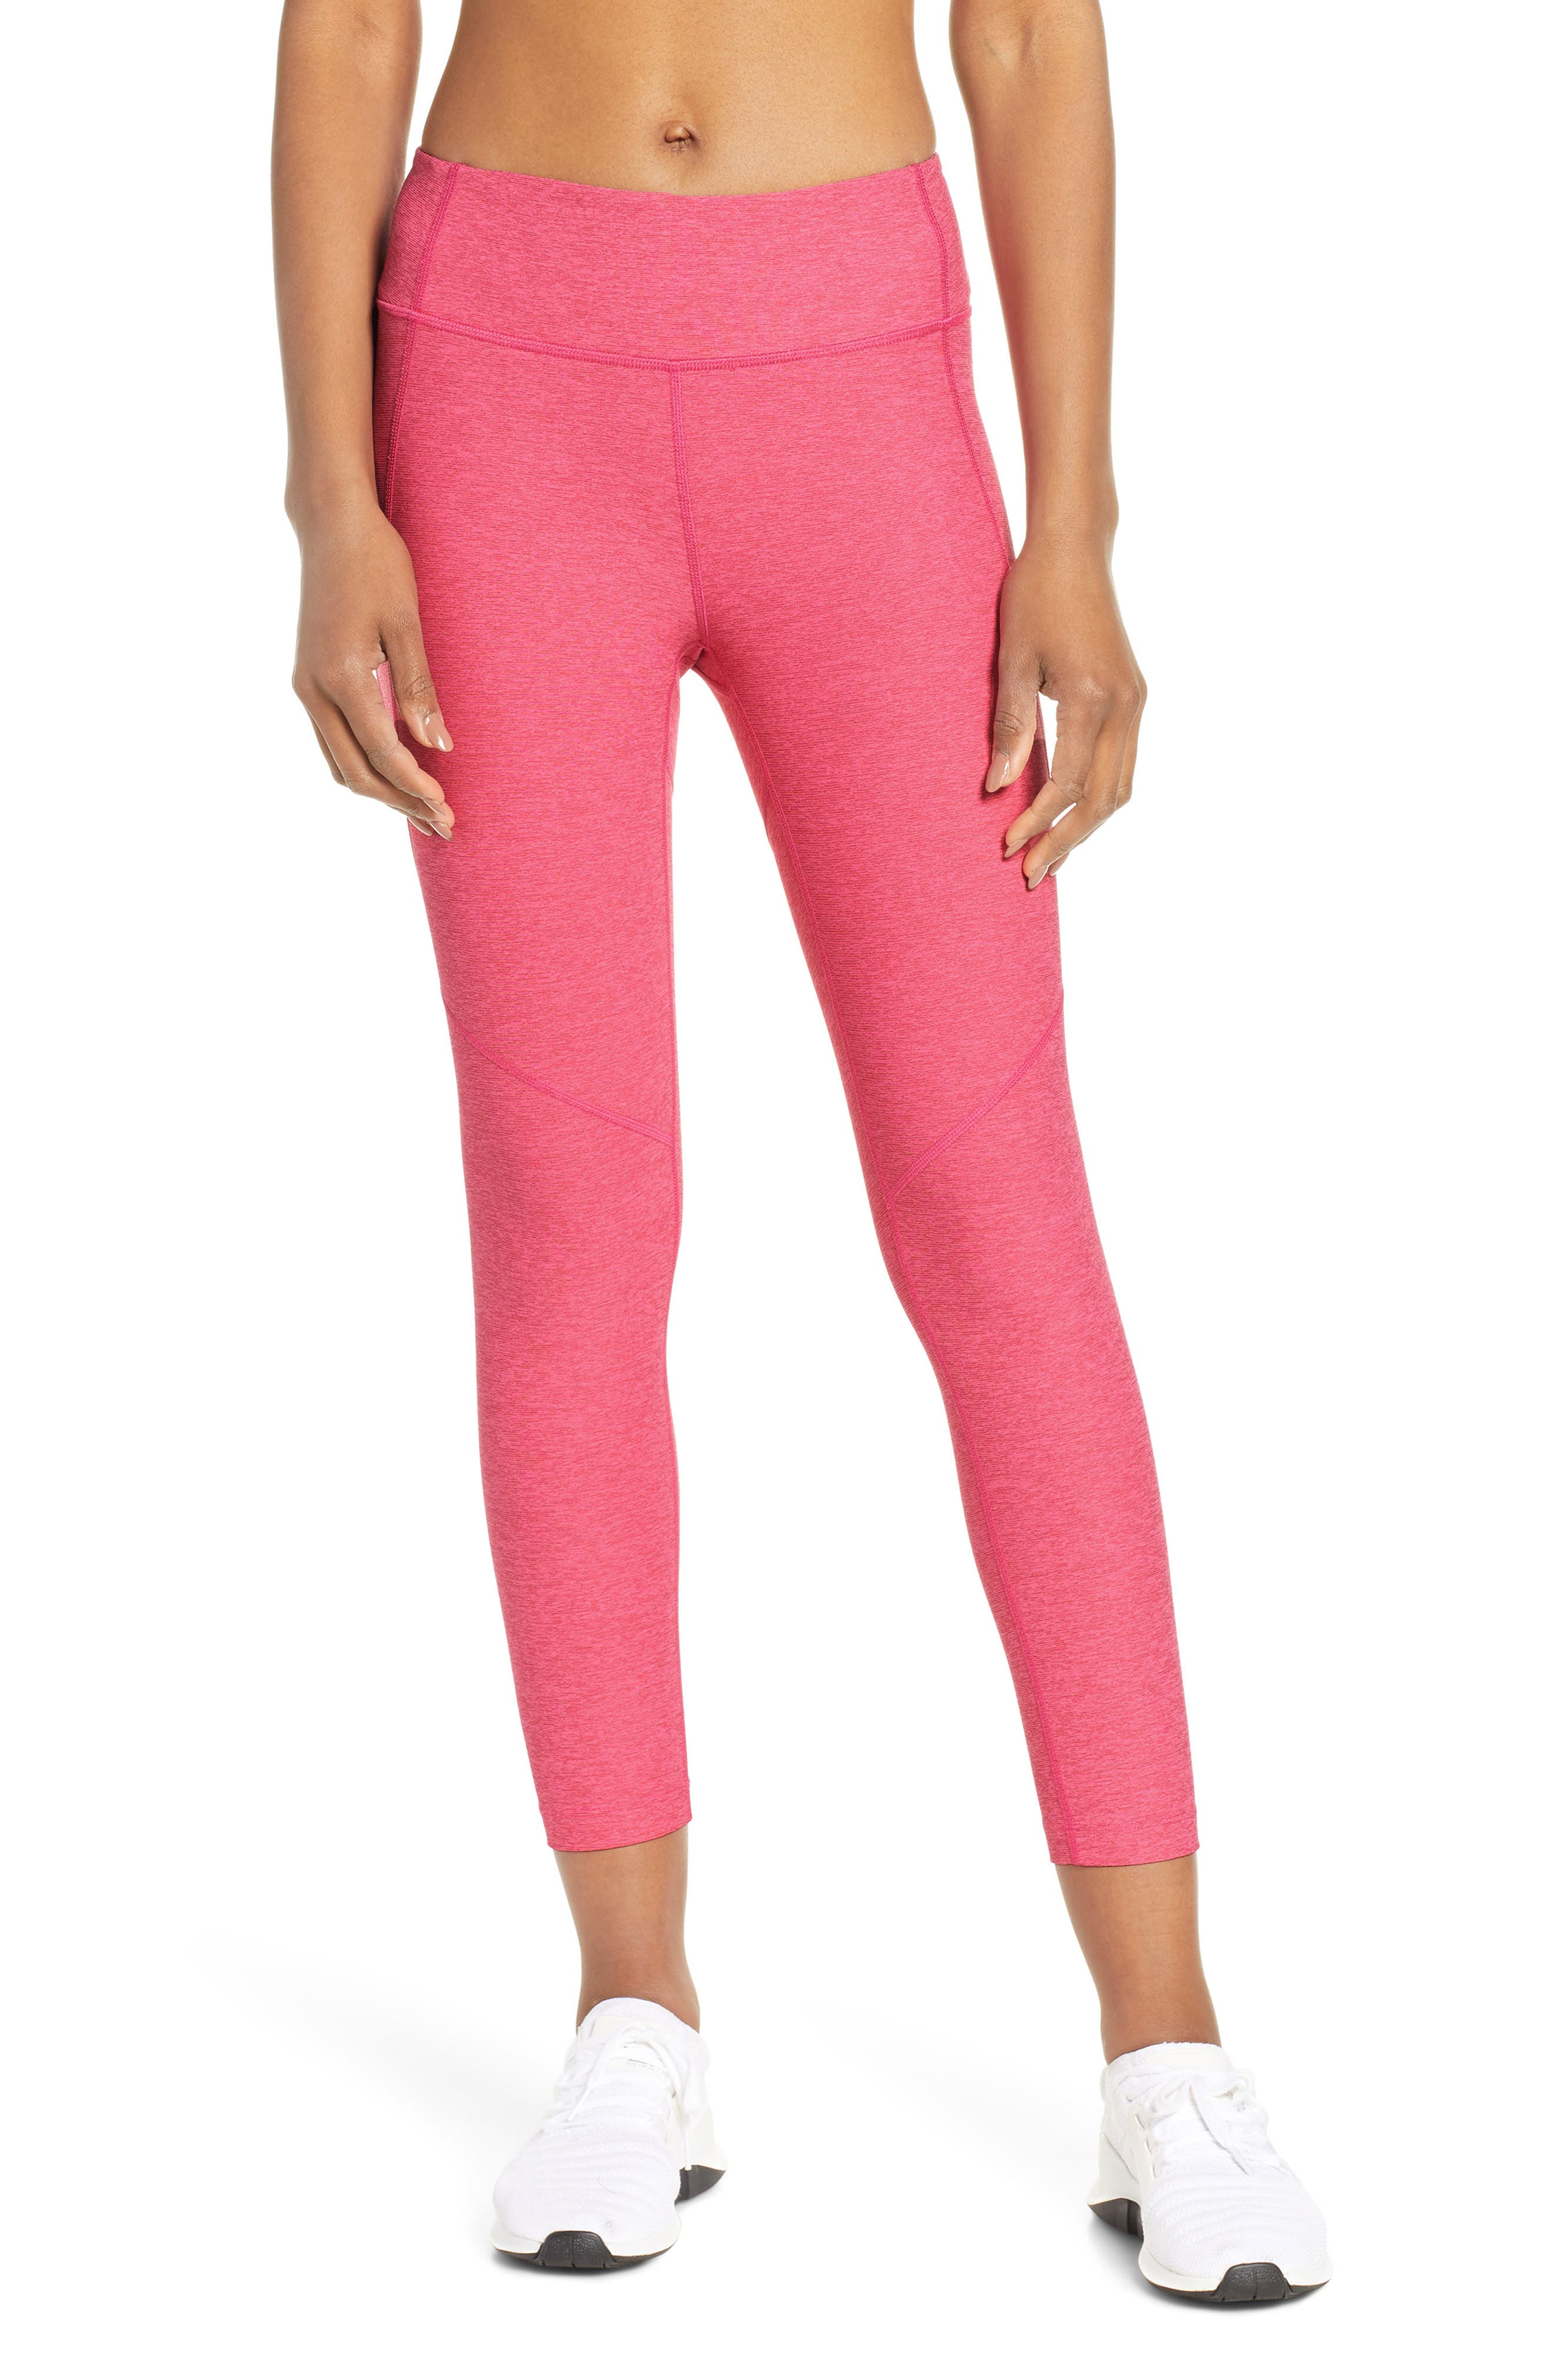 Outdoor Voices Warm-Up Crop Leggings, Pink